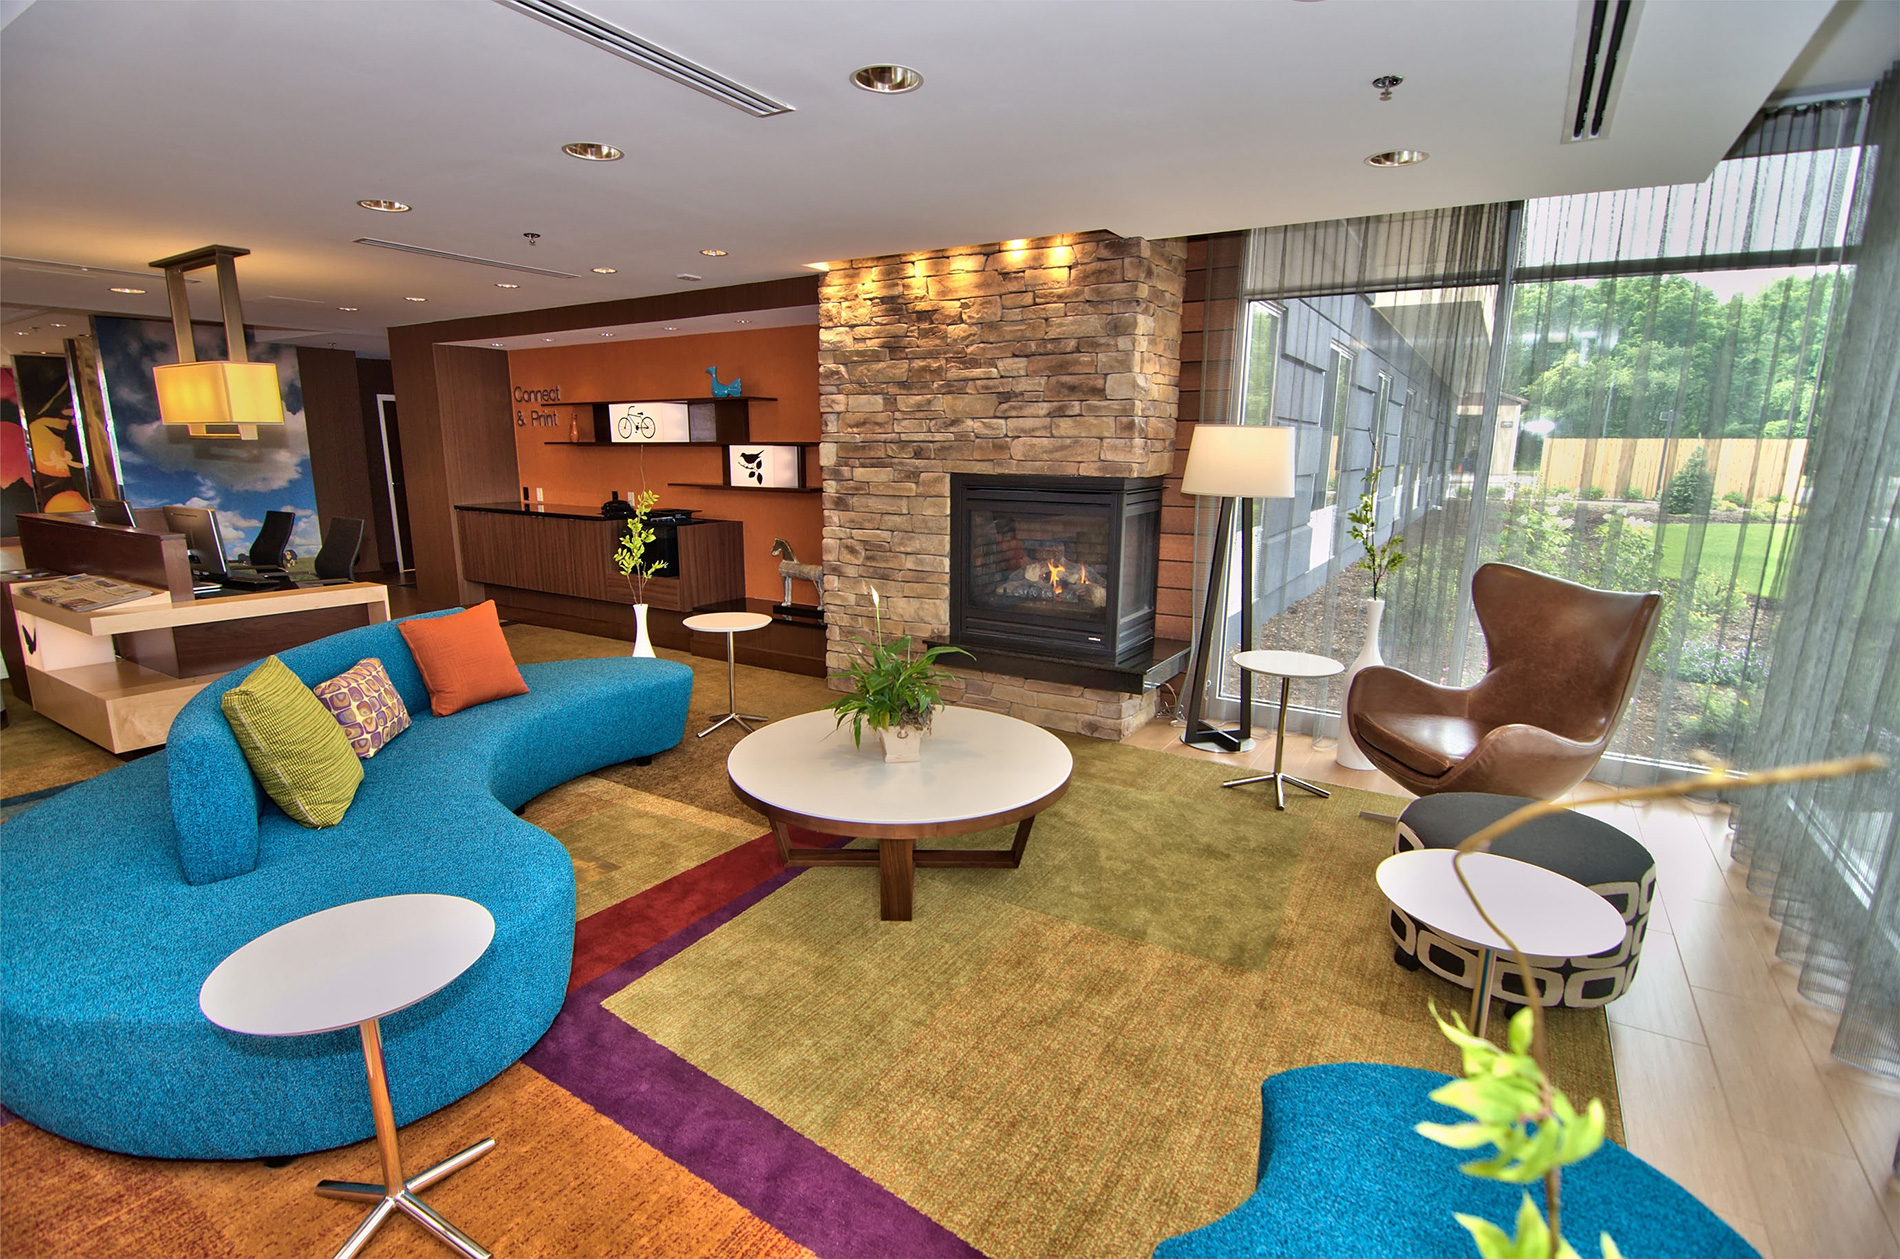 Shaner Hotel Group To Convert Crowne Plaza Paramus New Jersey Fairfield Inn Suites